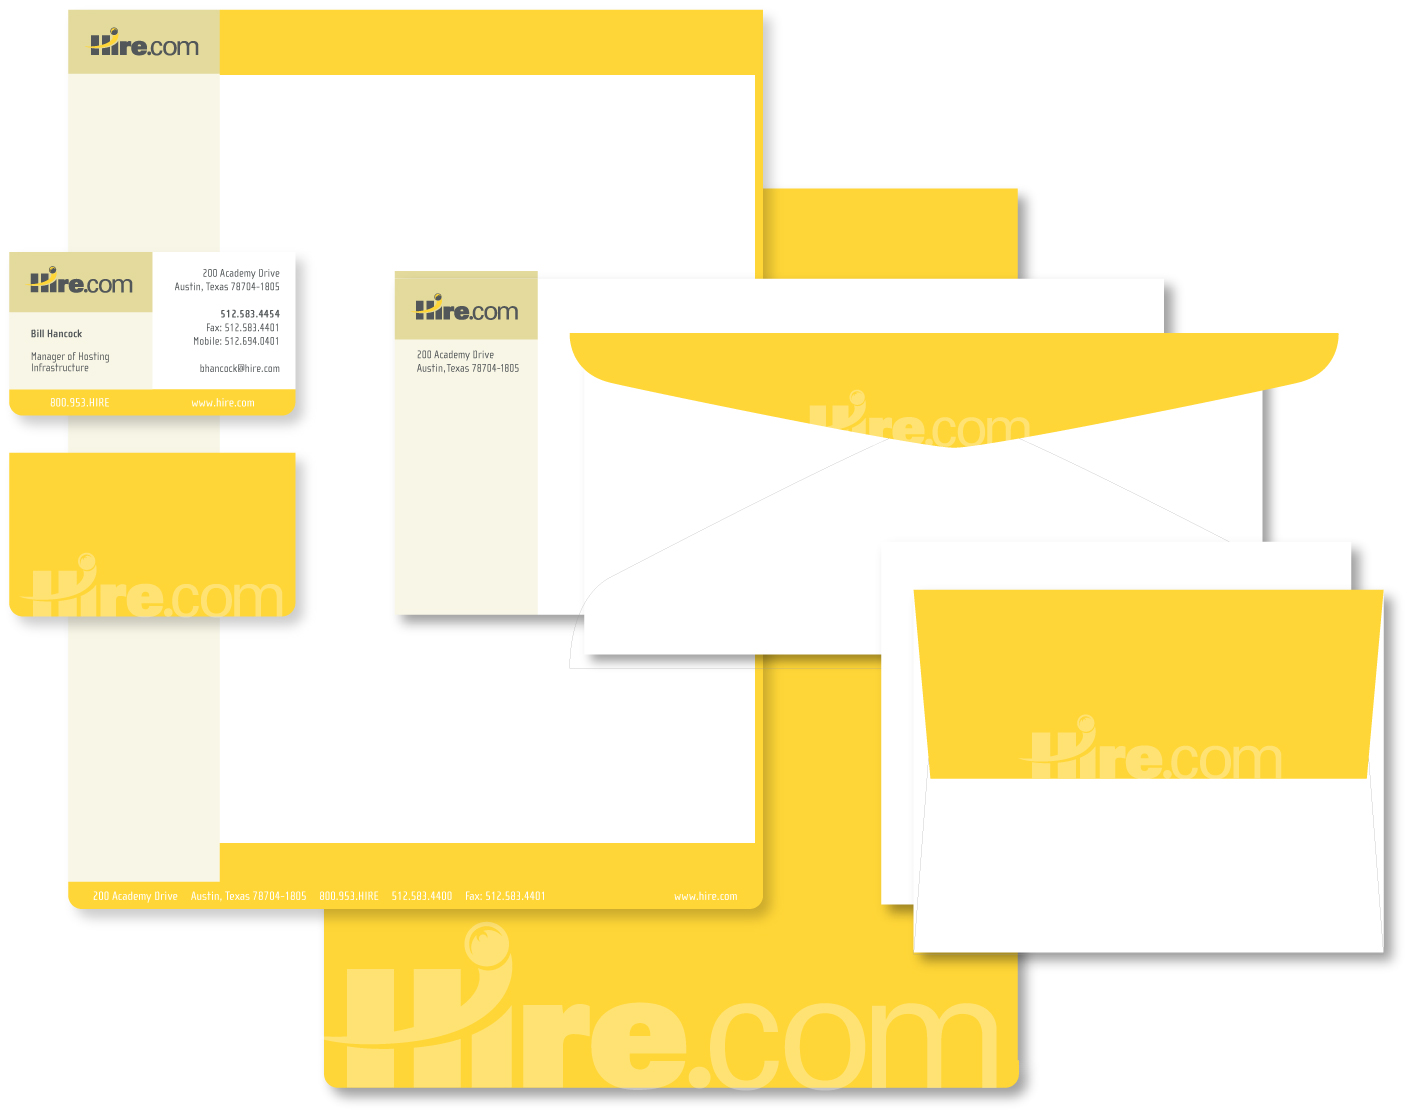 Hire.com Stationery System